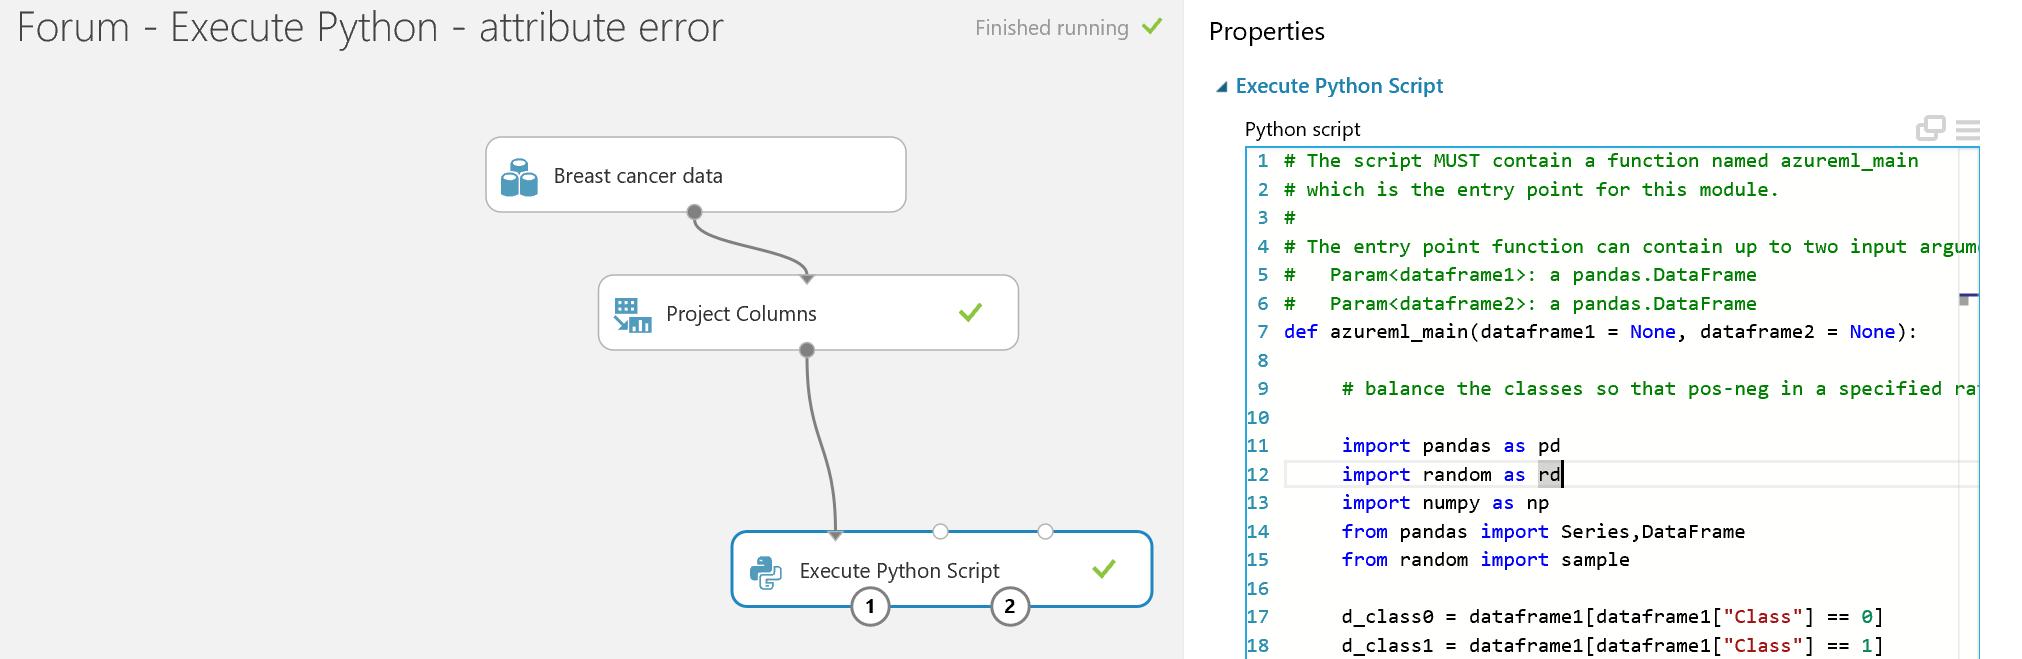 AttributeError: 'DataFrame' object has no attribute 'sample'